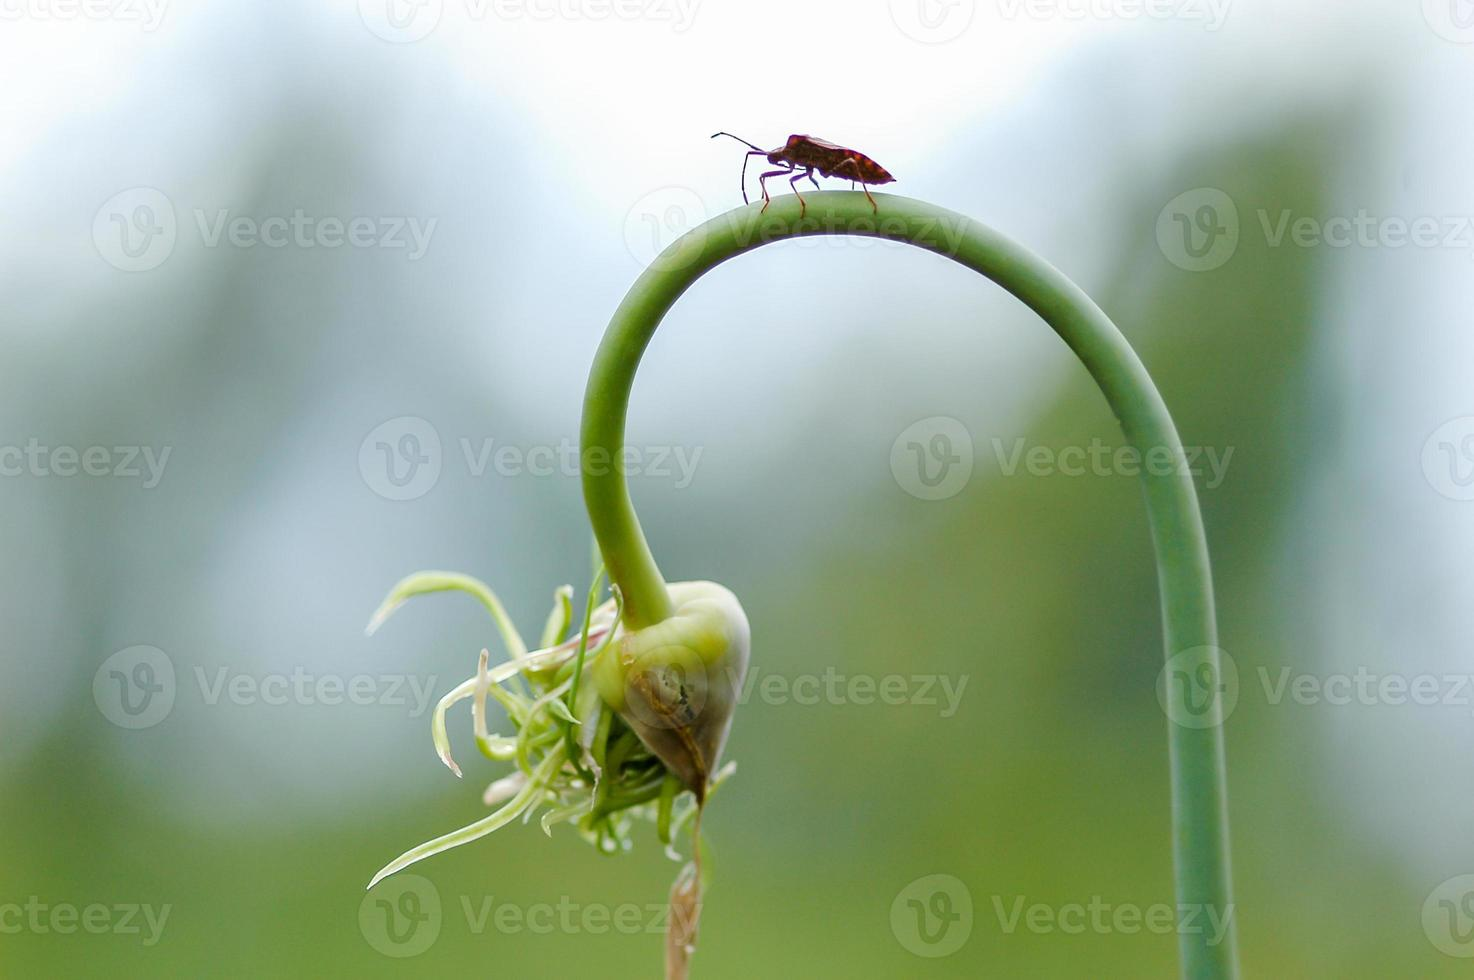 fly hemiptera Nezara Viridula Heteroptera pentatomidae palomera prasina on garlic photo